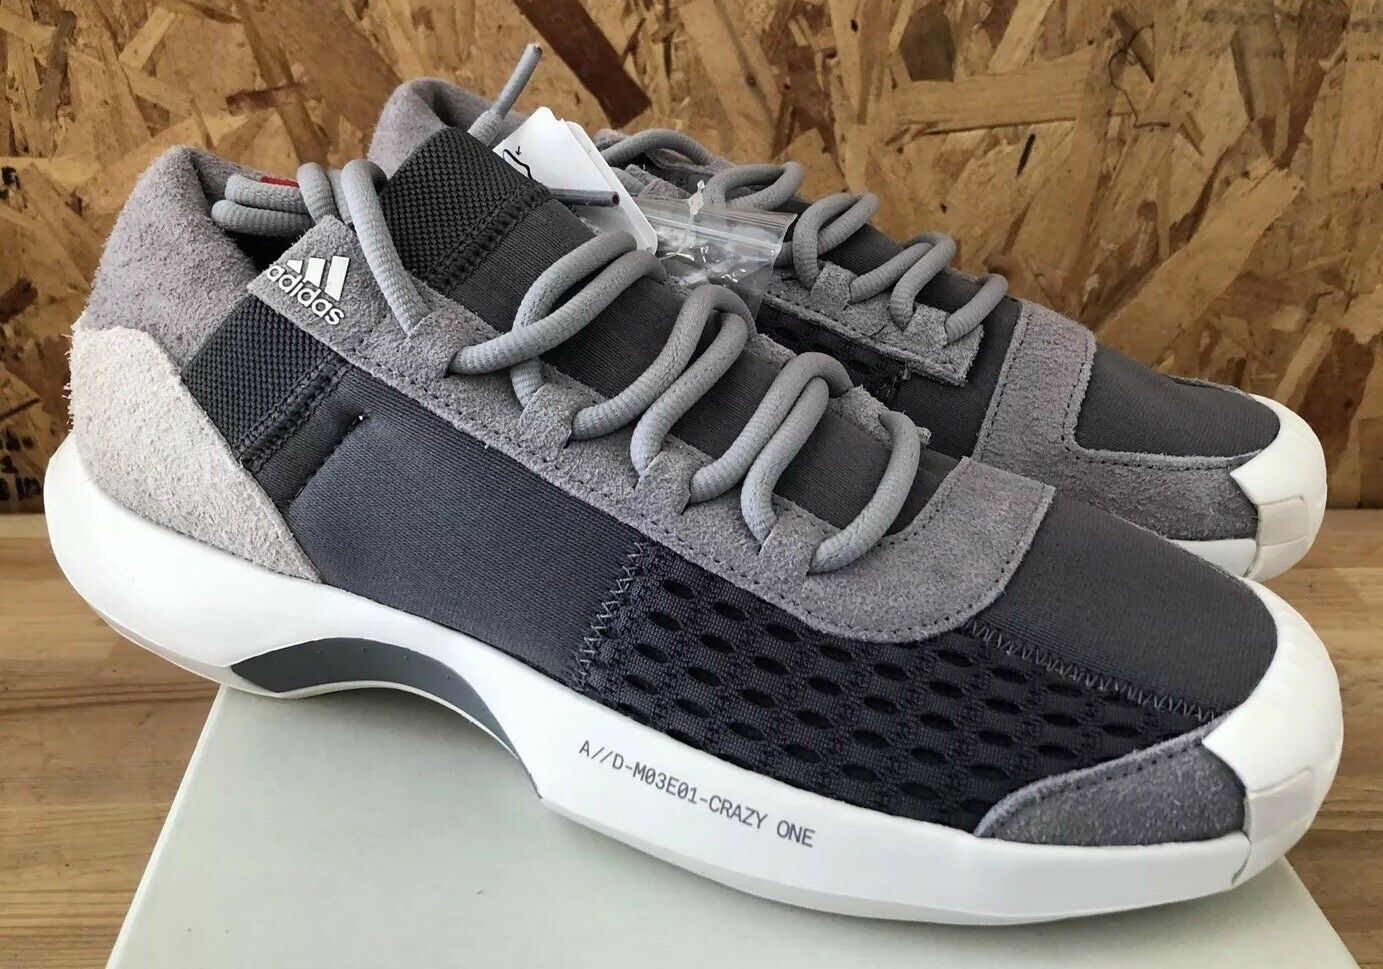 Adidas Crazy 1 A D CQ1868  grigio rosso Sz 11 NIB  presa di fabbrica